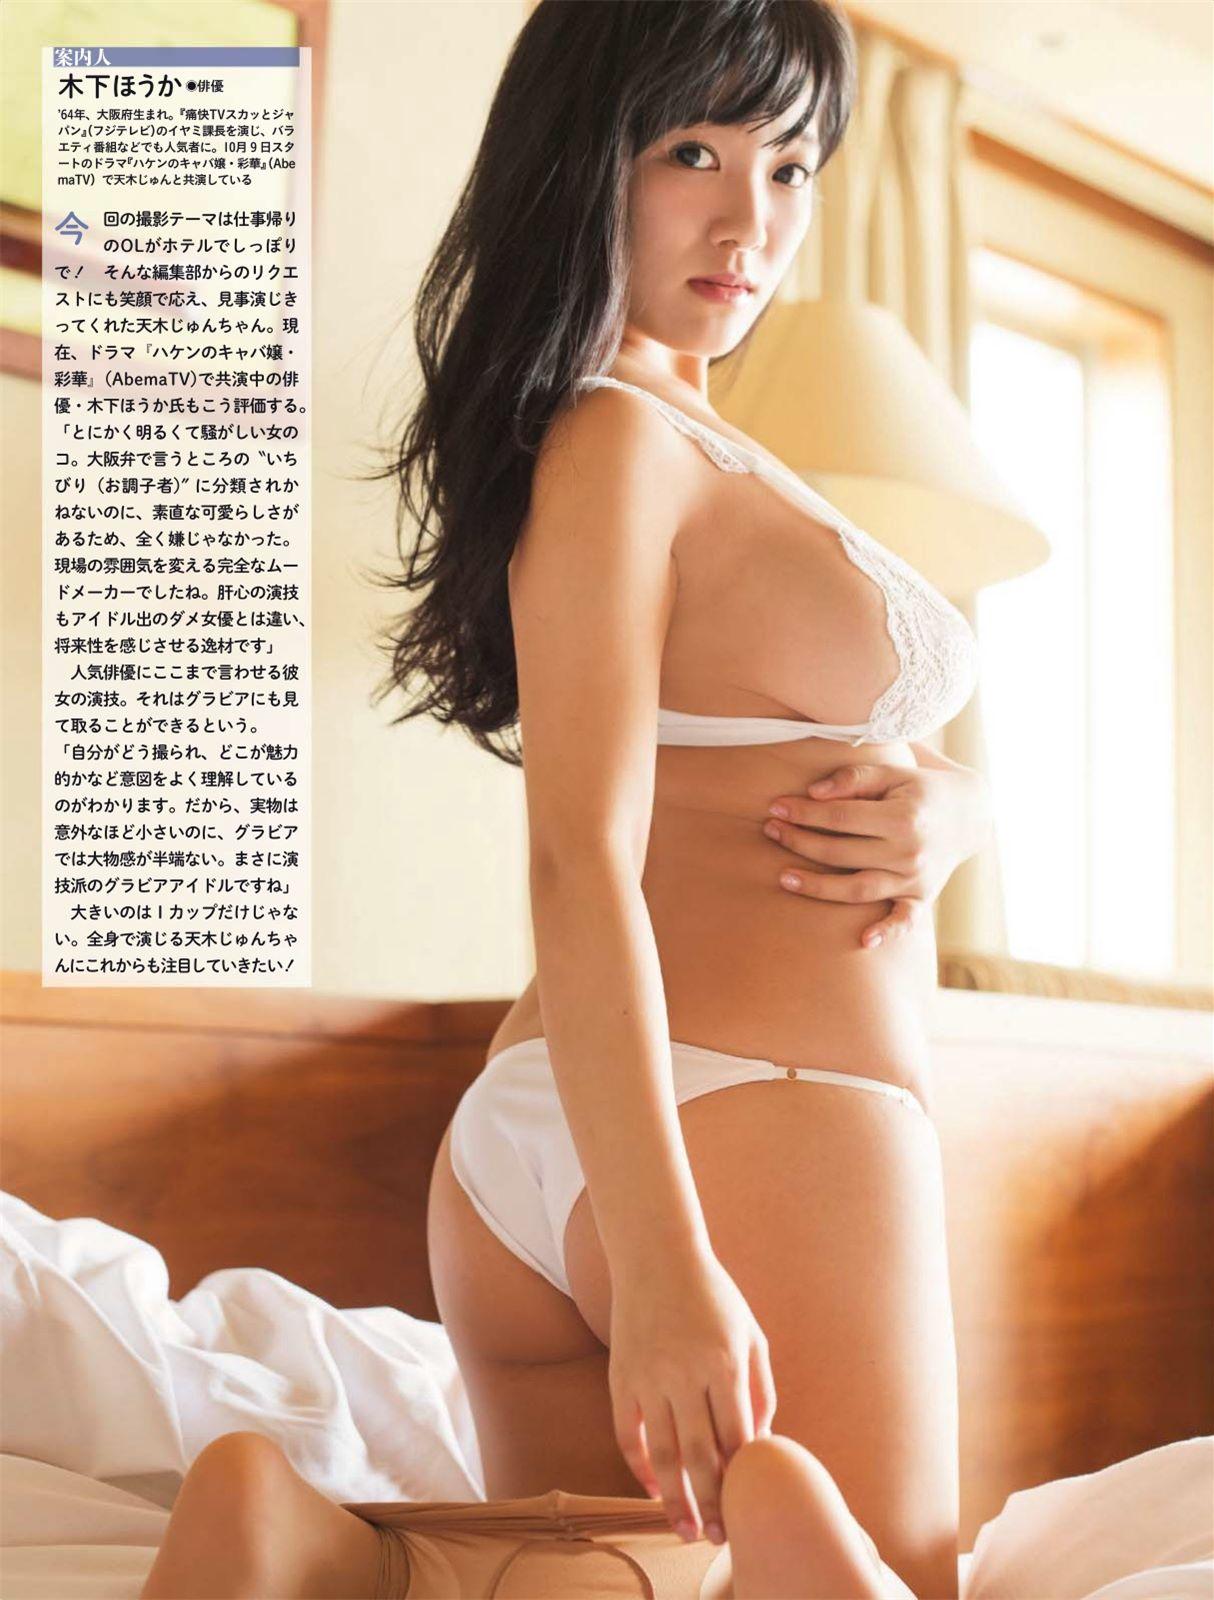 Jun Amaki 天木じゅん, Shukan SPA! 2017.10.24 (週刊スパ 2017年10月24日号)